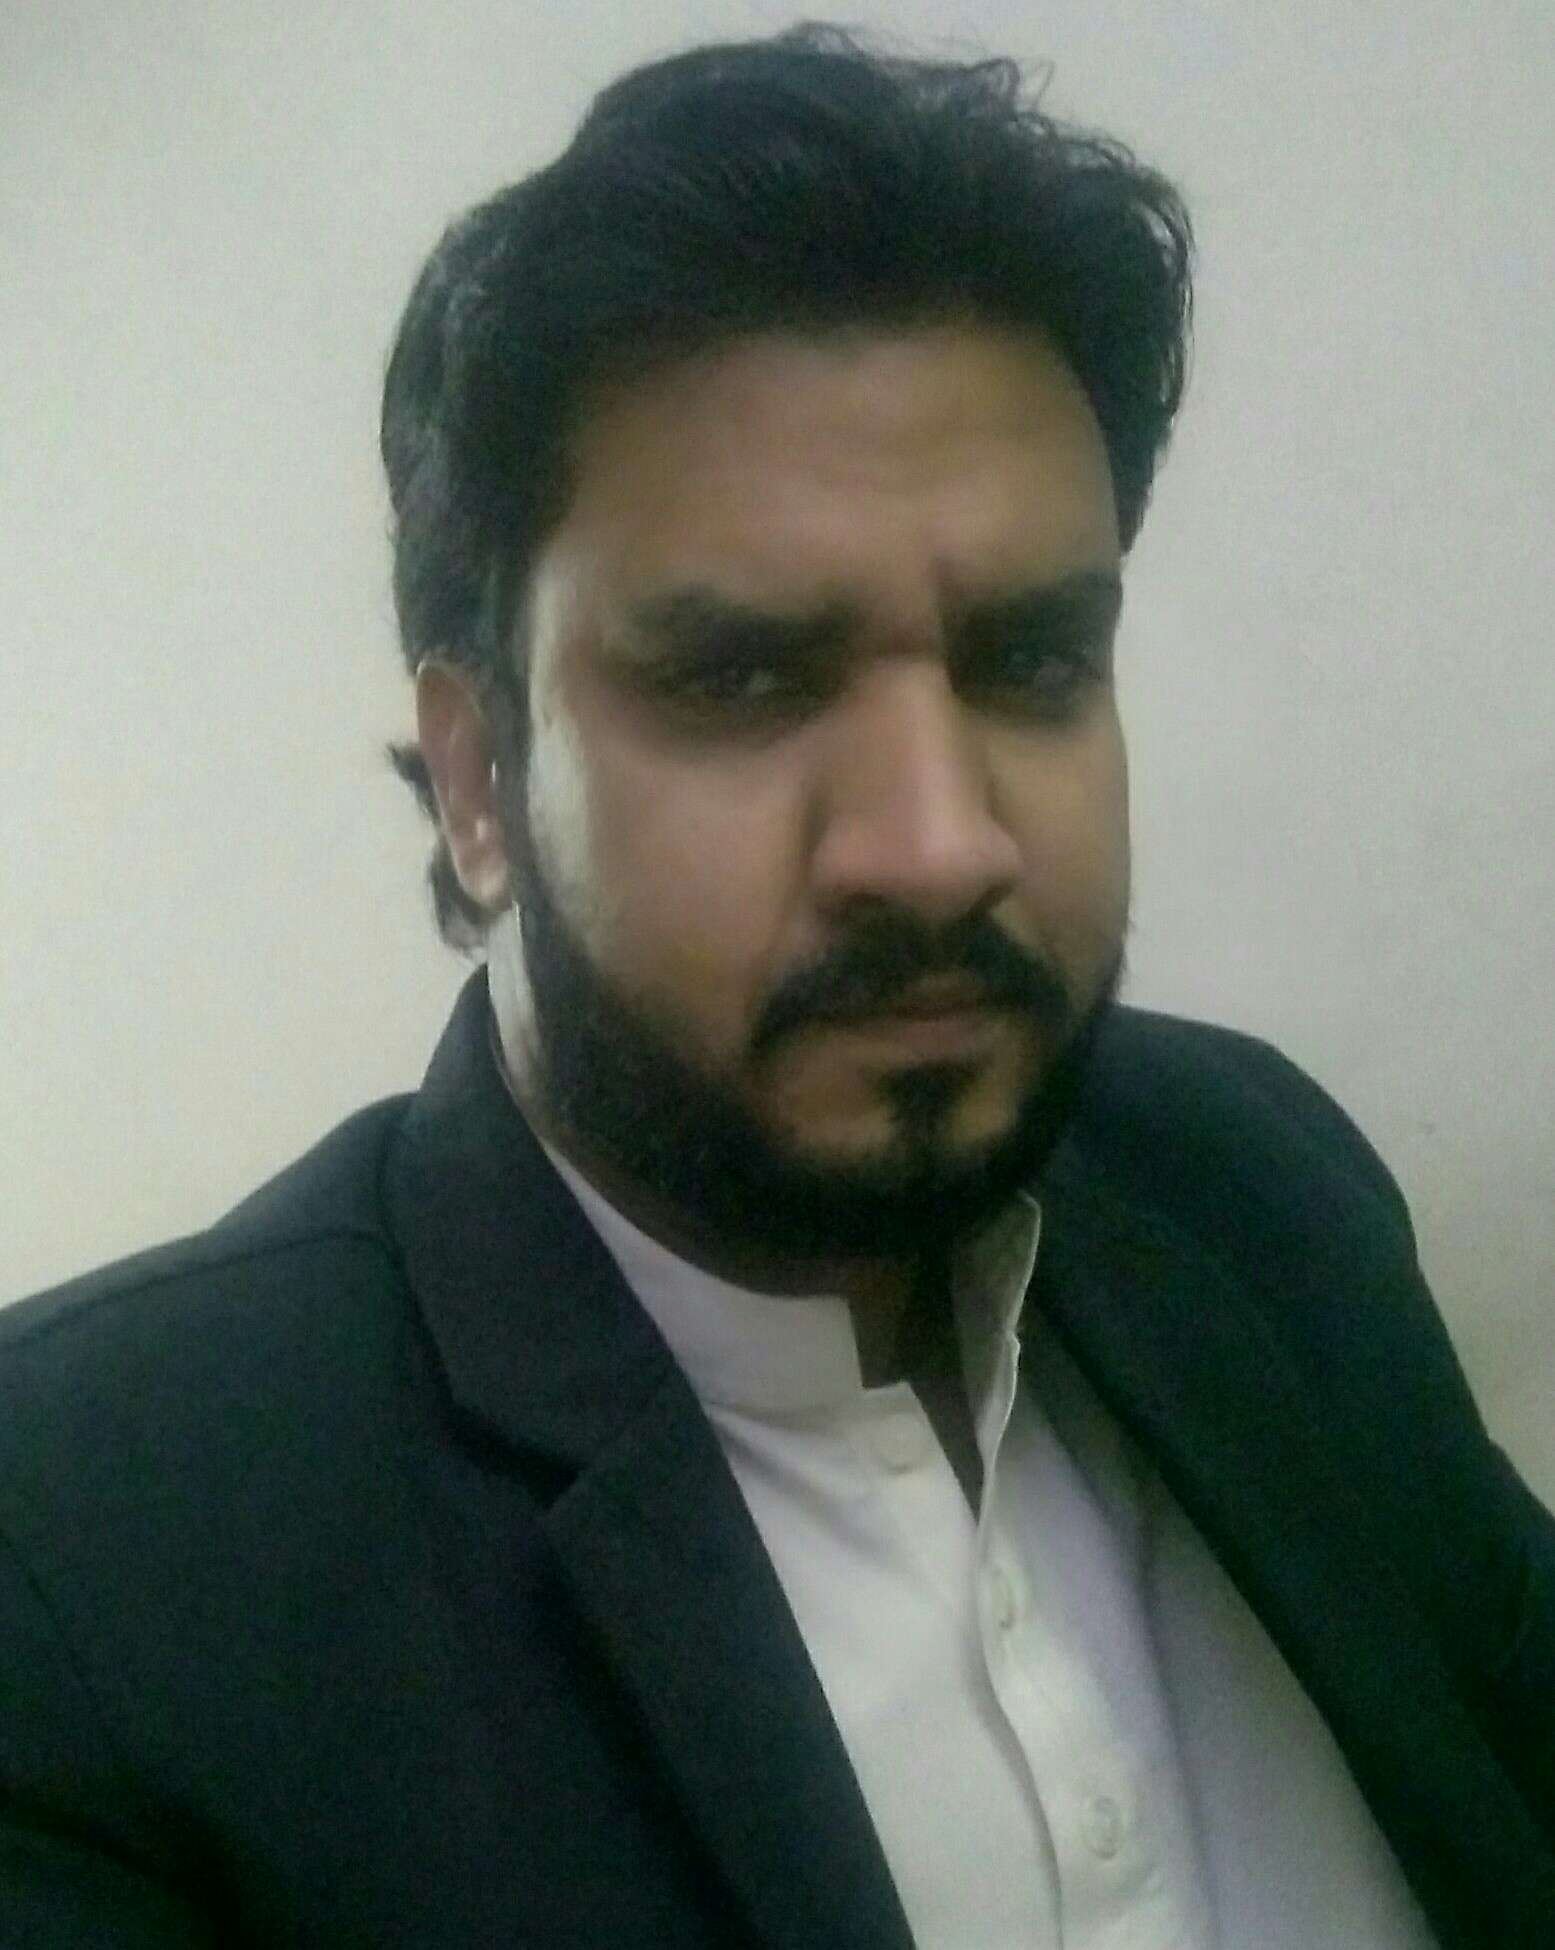 Imran Abbasi